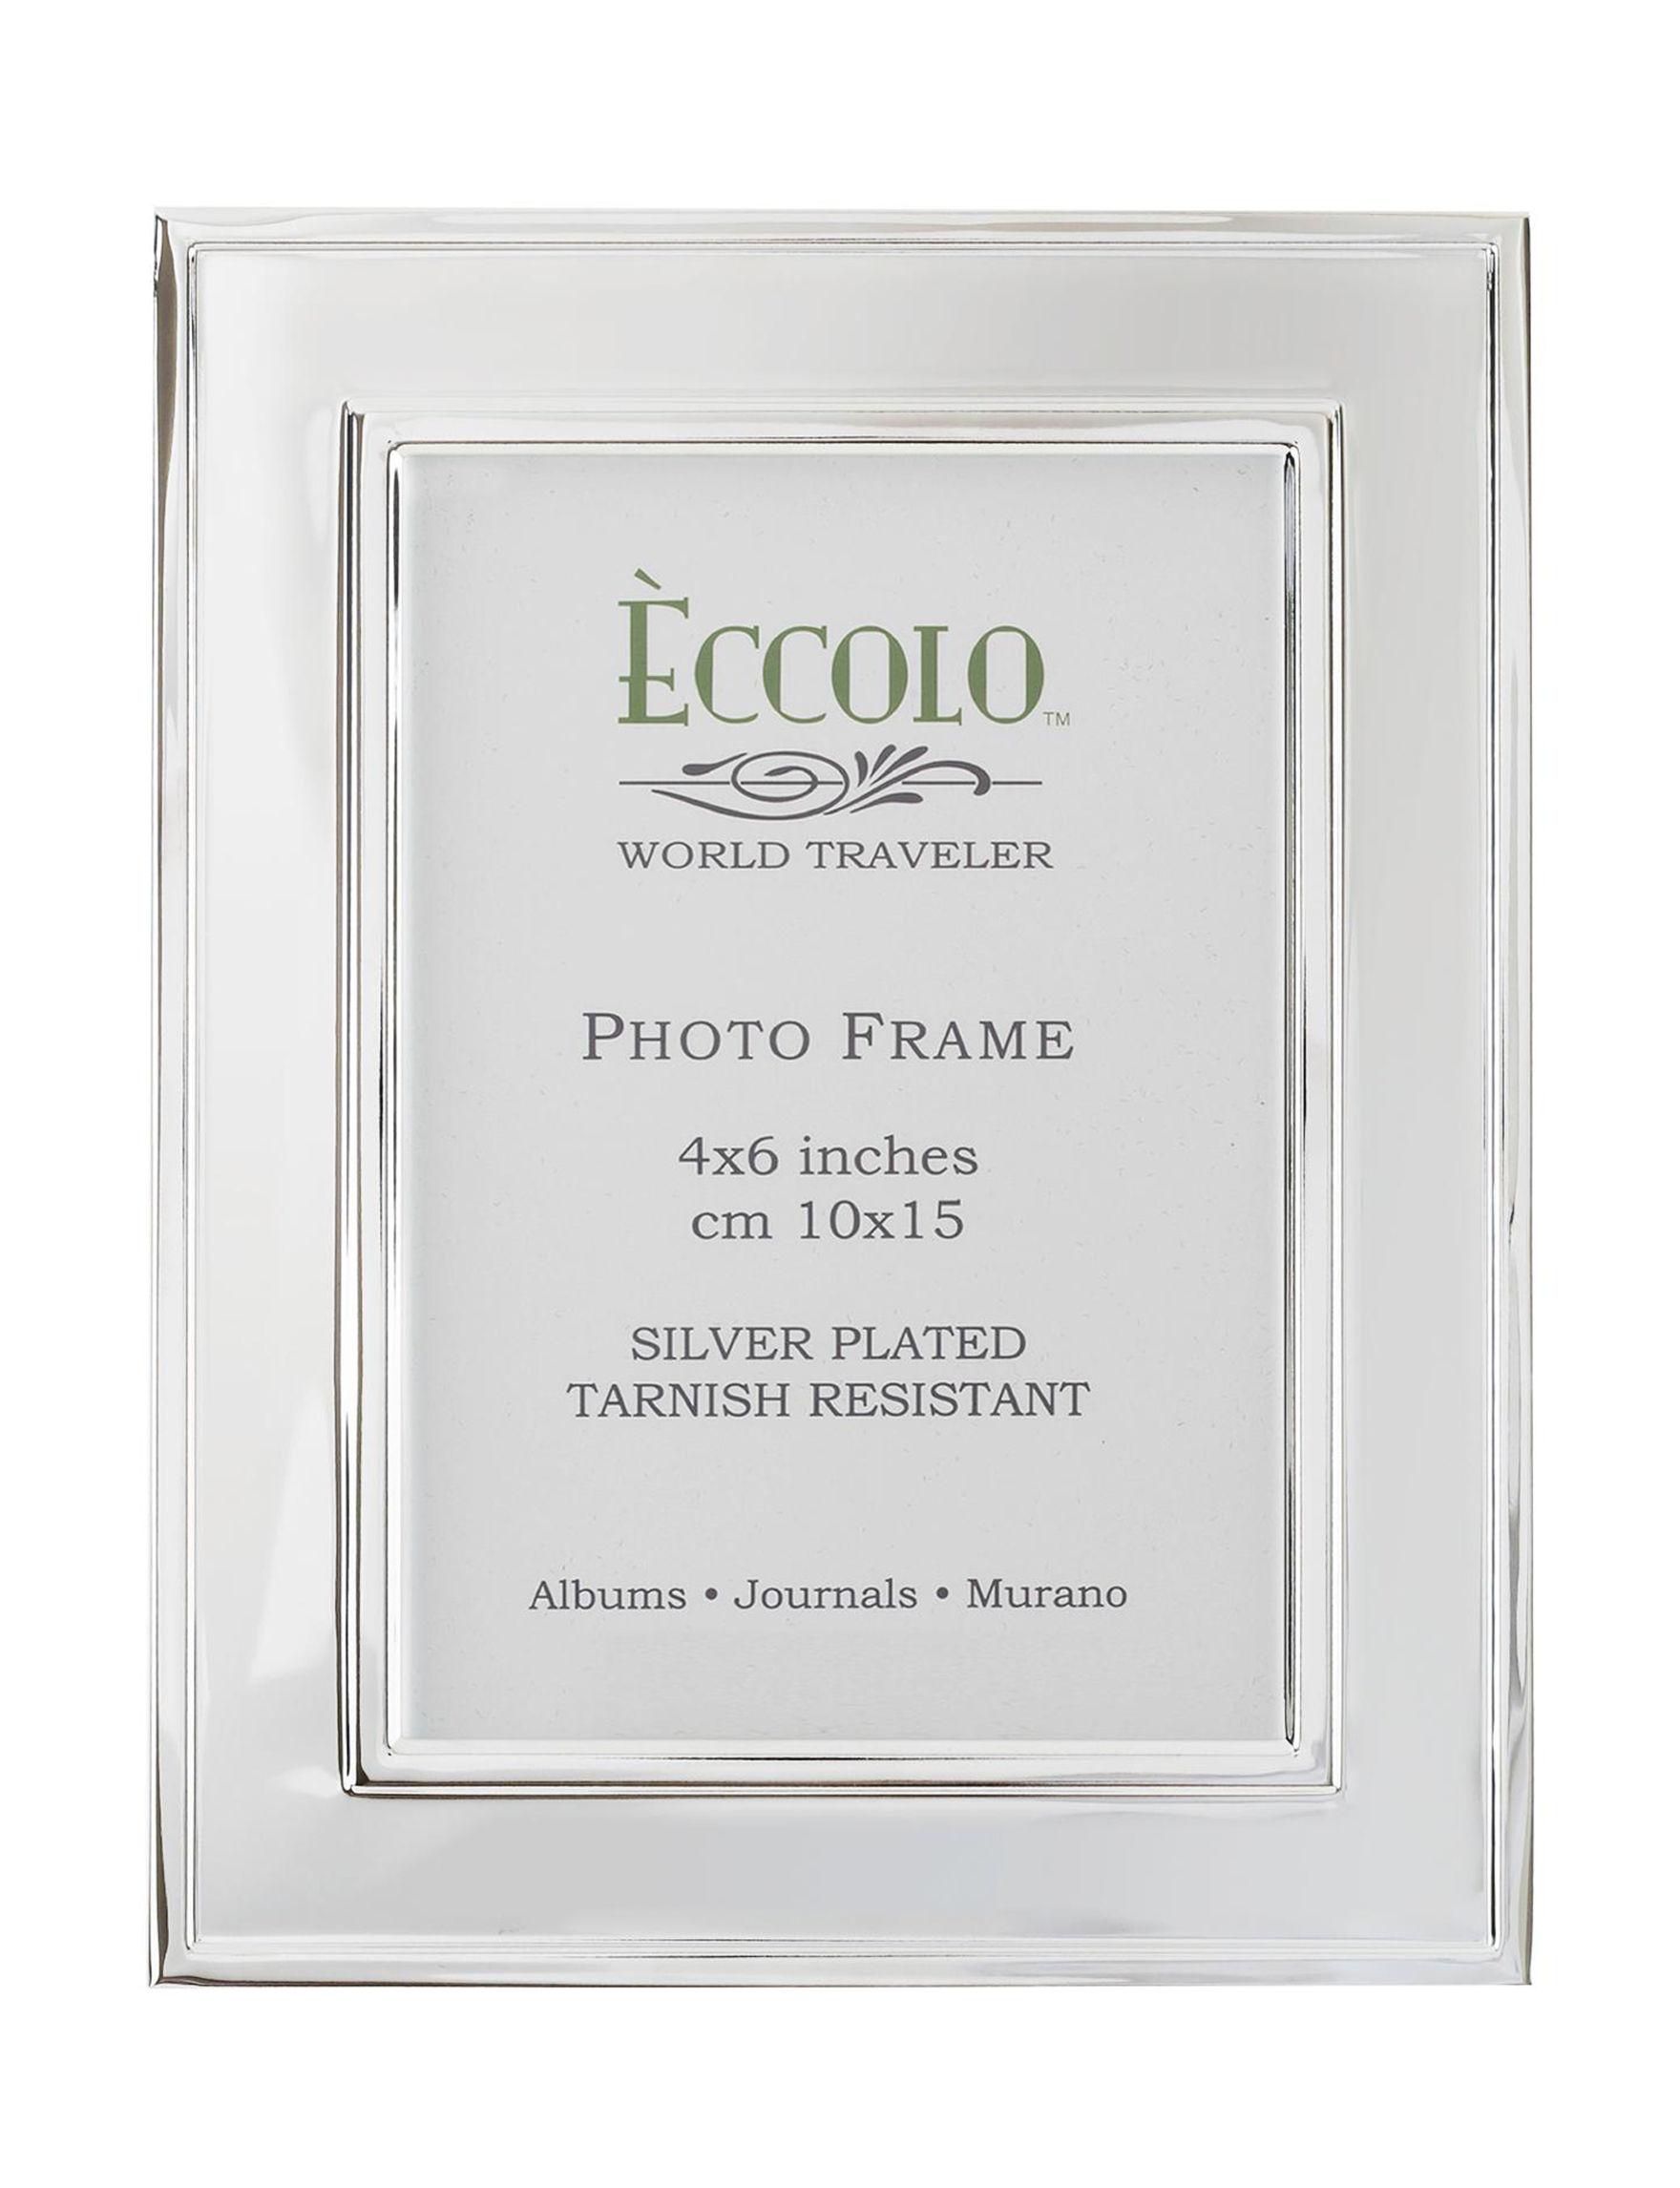 Eccolo Silver Frames & Shadow Boxes Home Accents